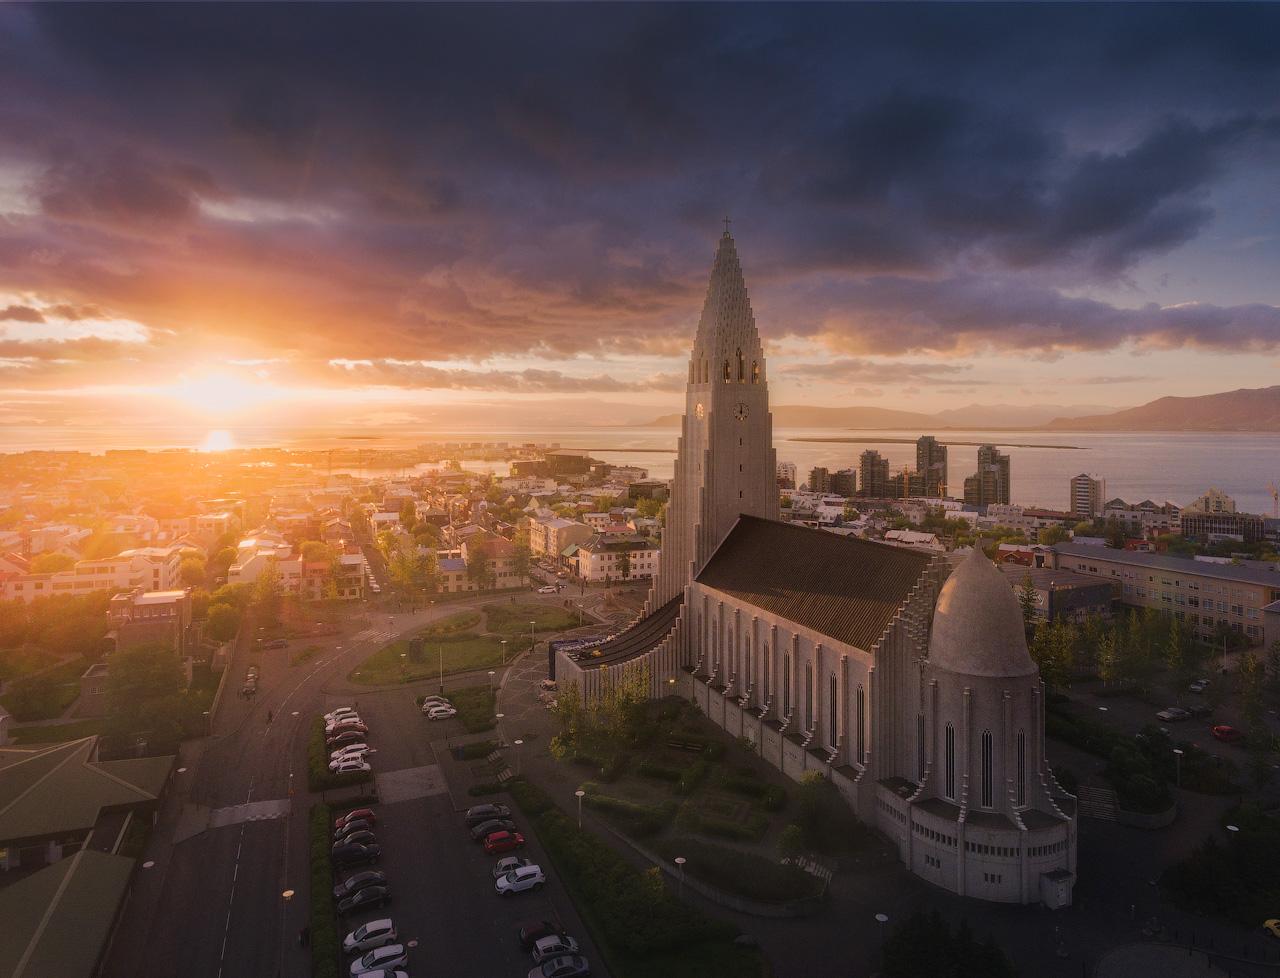 Hallgrimskirkja教堂可以说是首都雷克雅未克最具标志性的景点之一,在这里,您可以看到它沐浴在温暖的夕阳下。